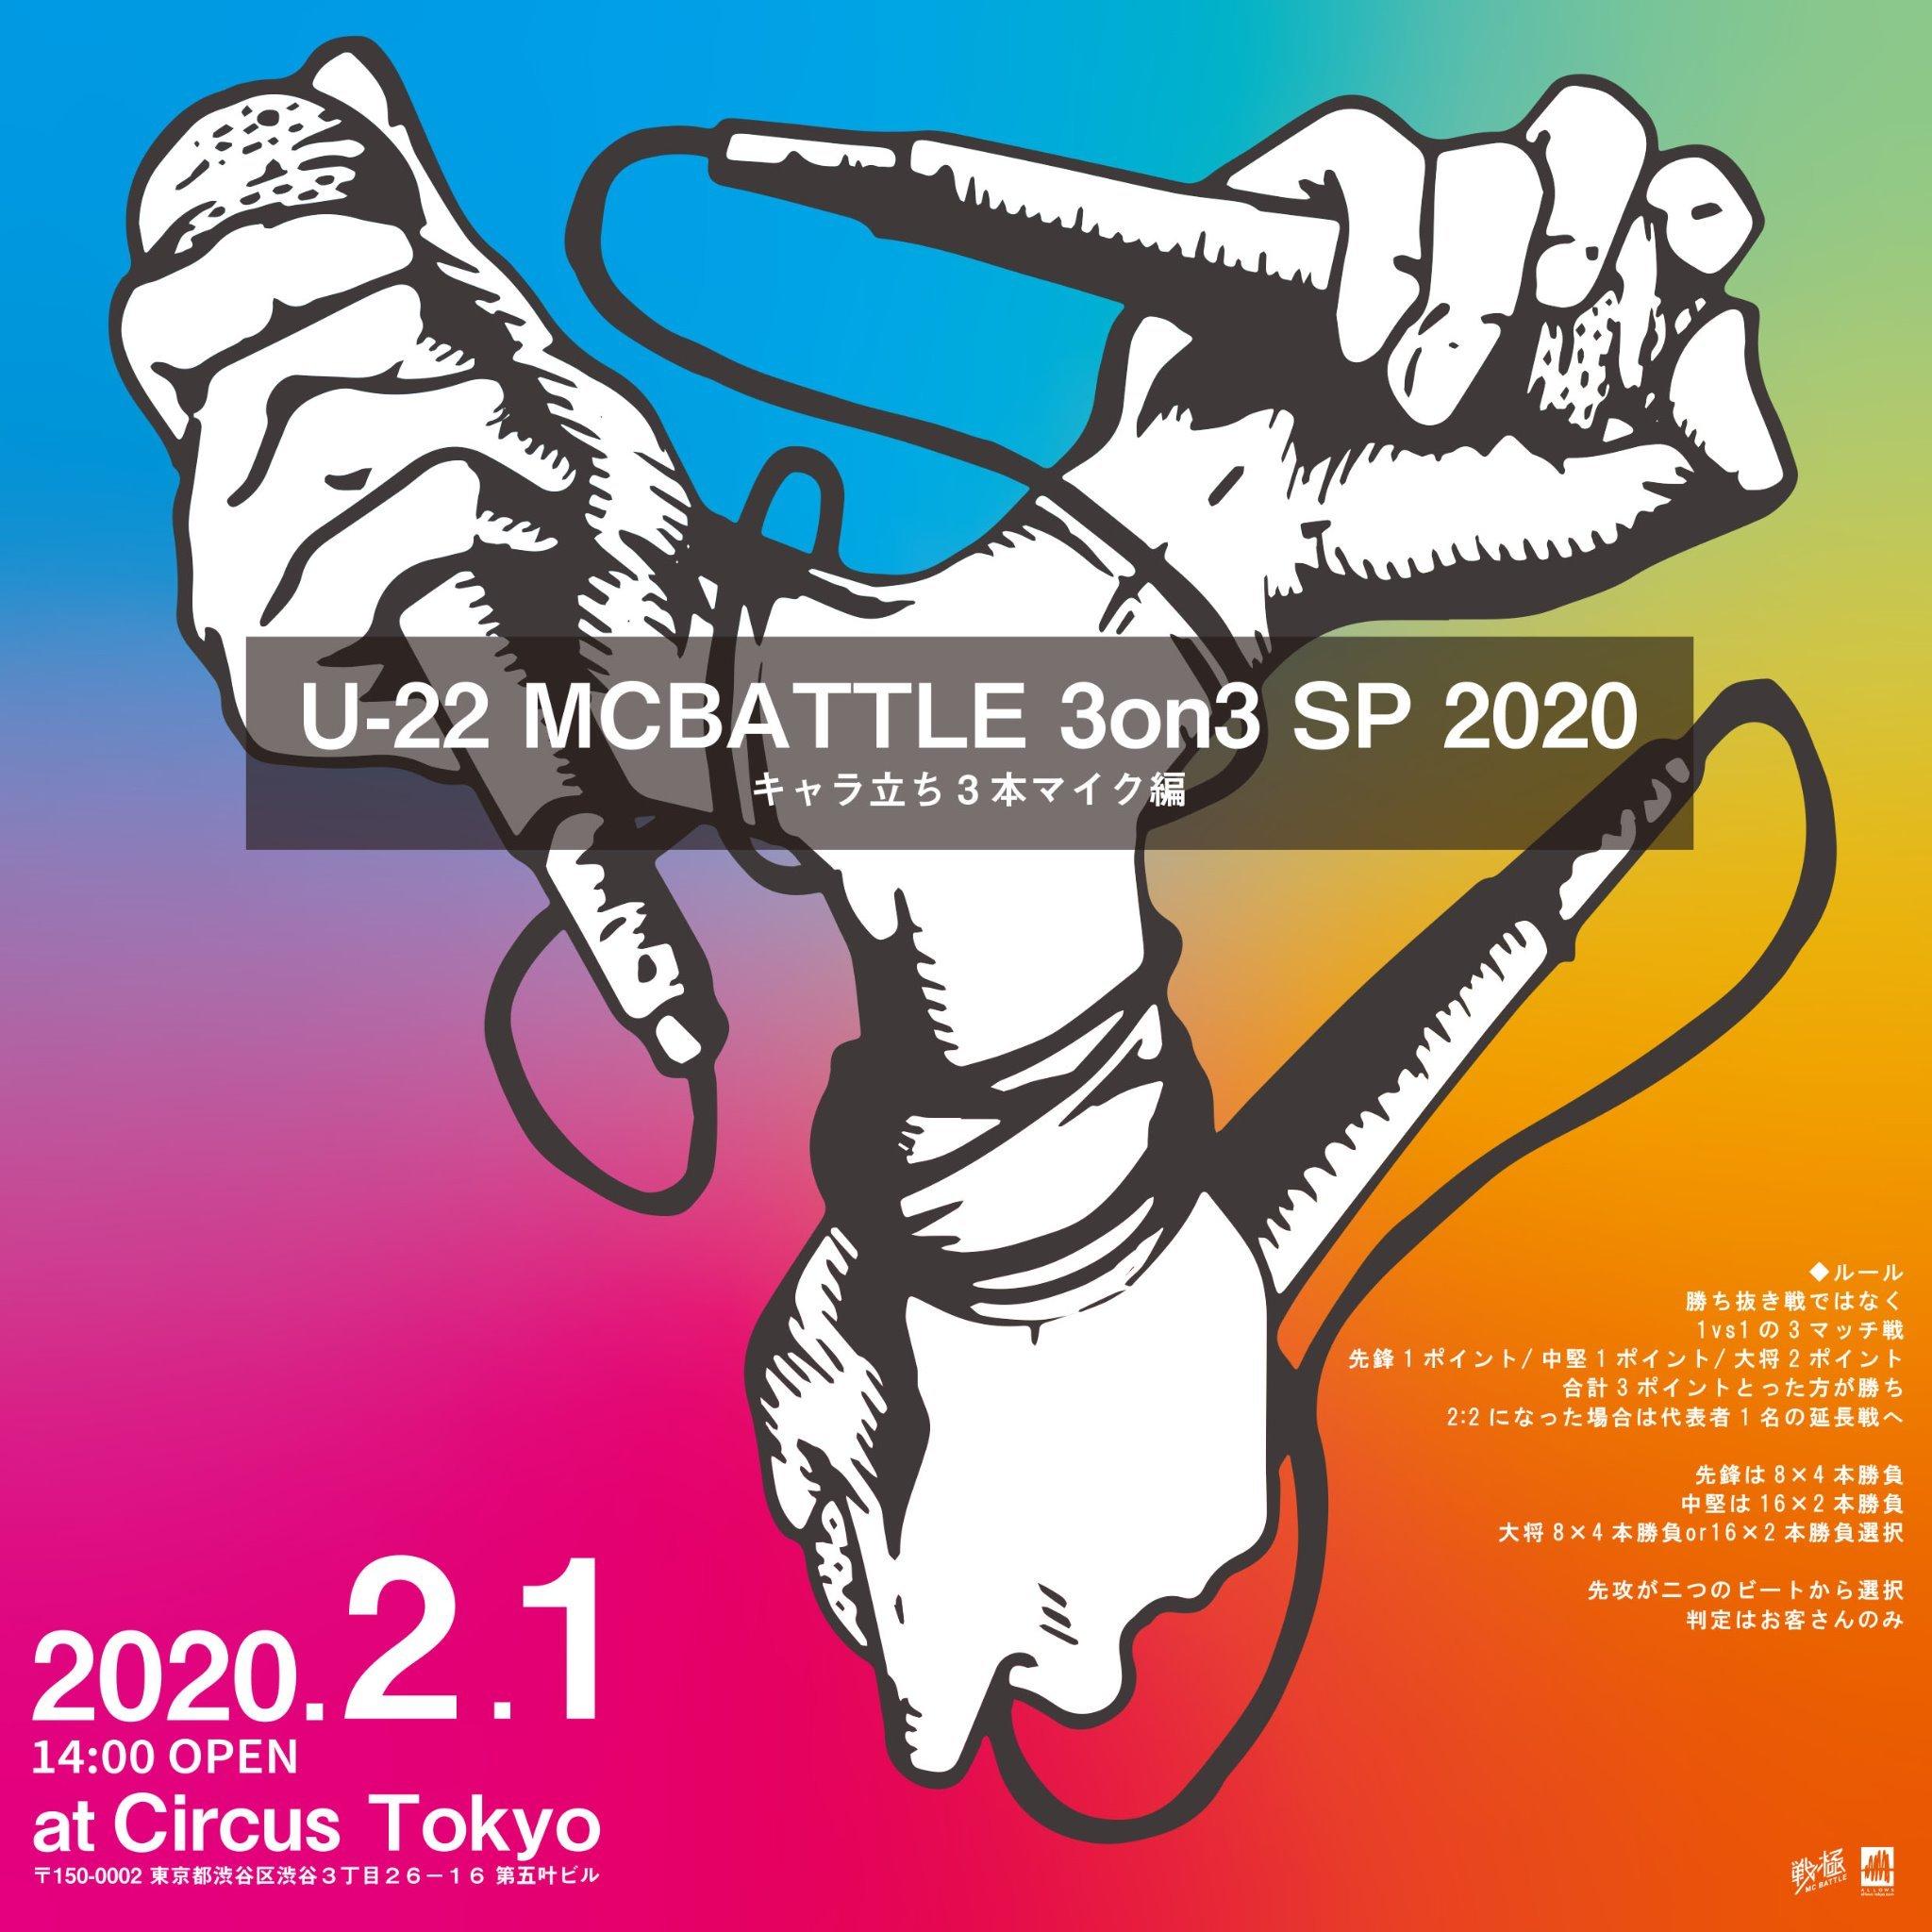 2/1 U-22 MCBATTLE 3on3 SP 2020 チケット販売開始!8チーム中!_e0246863_05065616.jpg